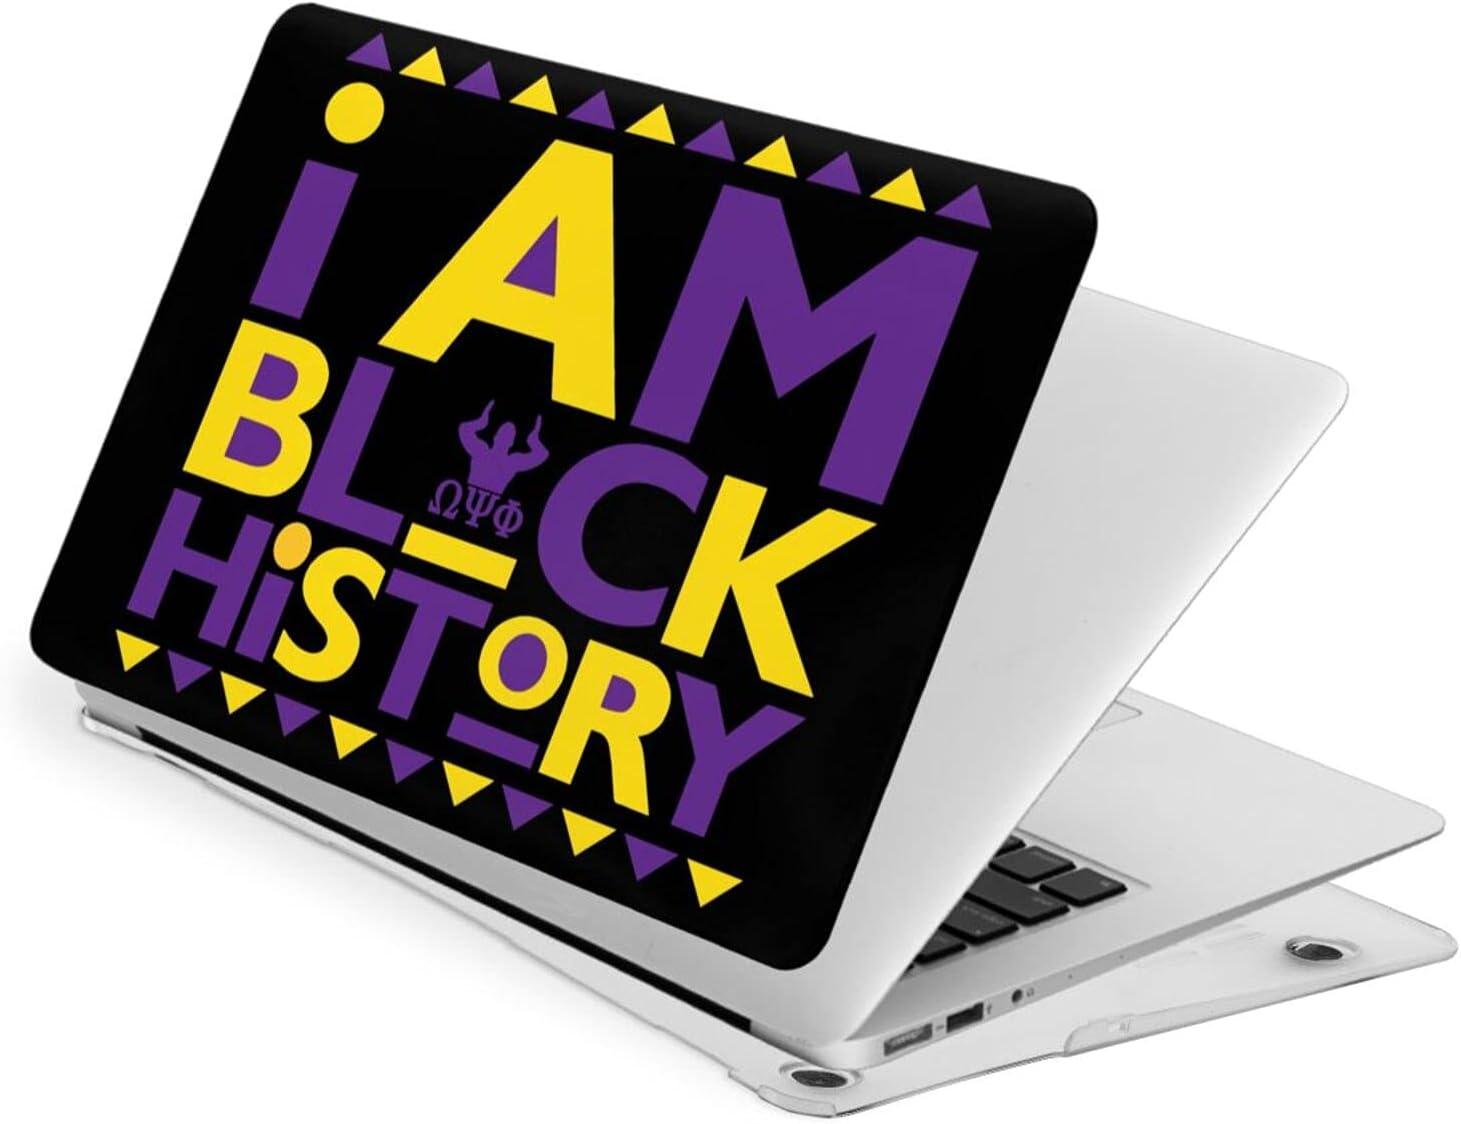 ZHUOBAIL Om-e_g-a P_s_i P-hi Product 1911 Fraternity Pro MacBook Popular standard OPP Cas